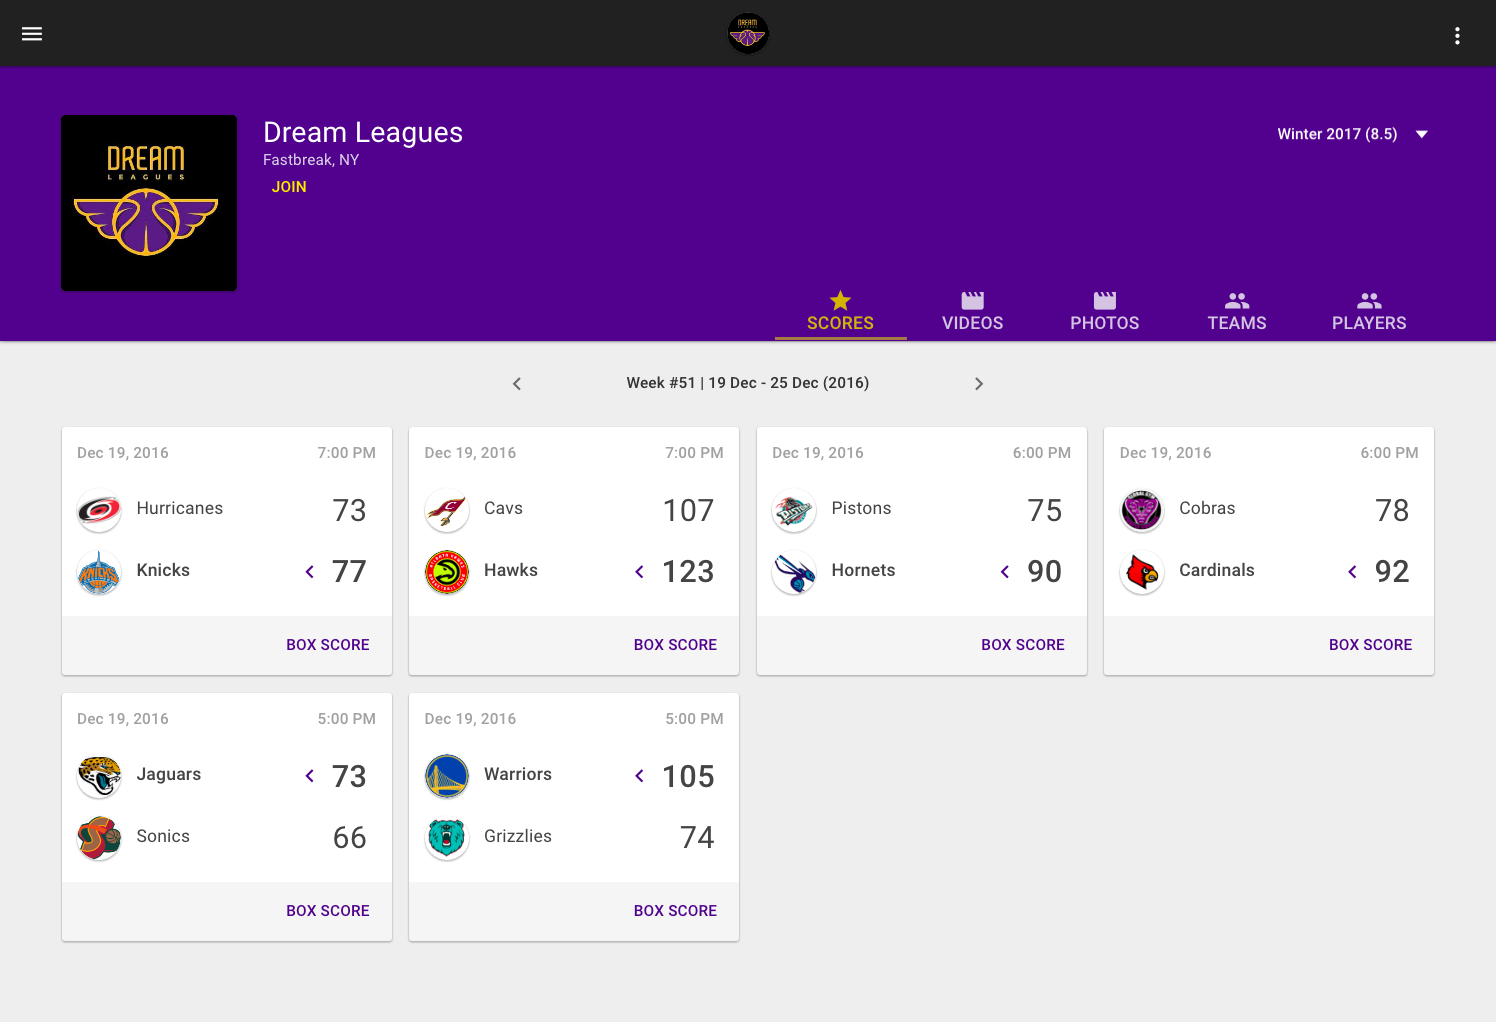 wooter+league+hub+platform+dream+leagues+basketball-1.png